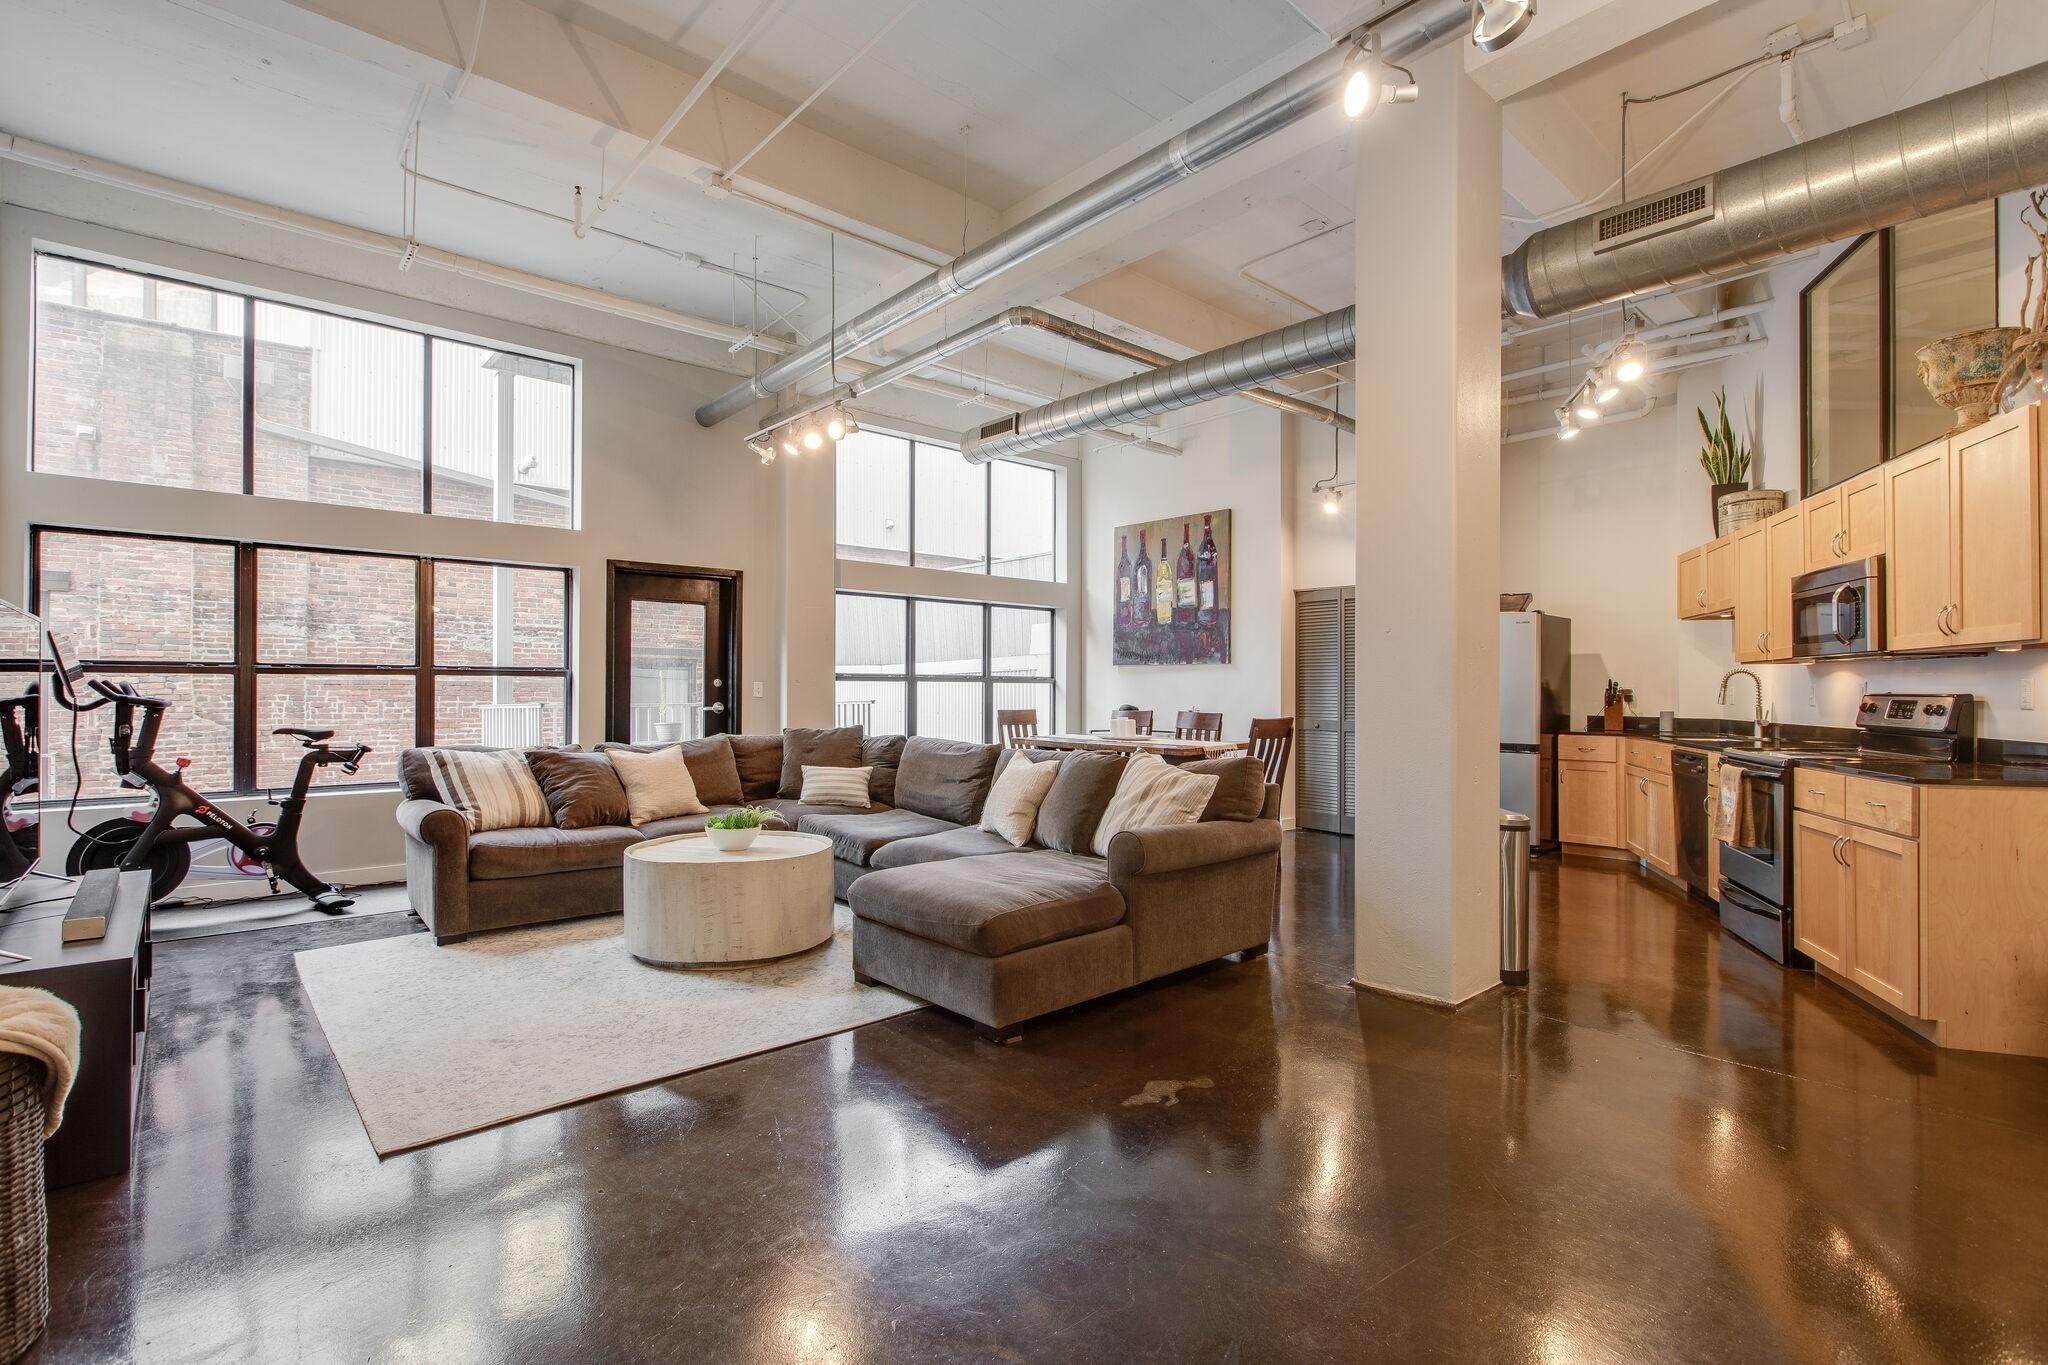 239 5th Ave N #402 Property Photo - Nashville, TN real estate listing